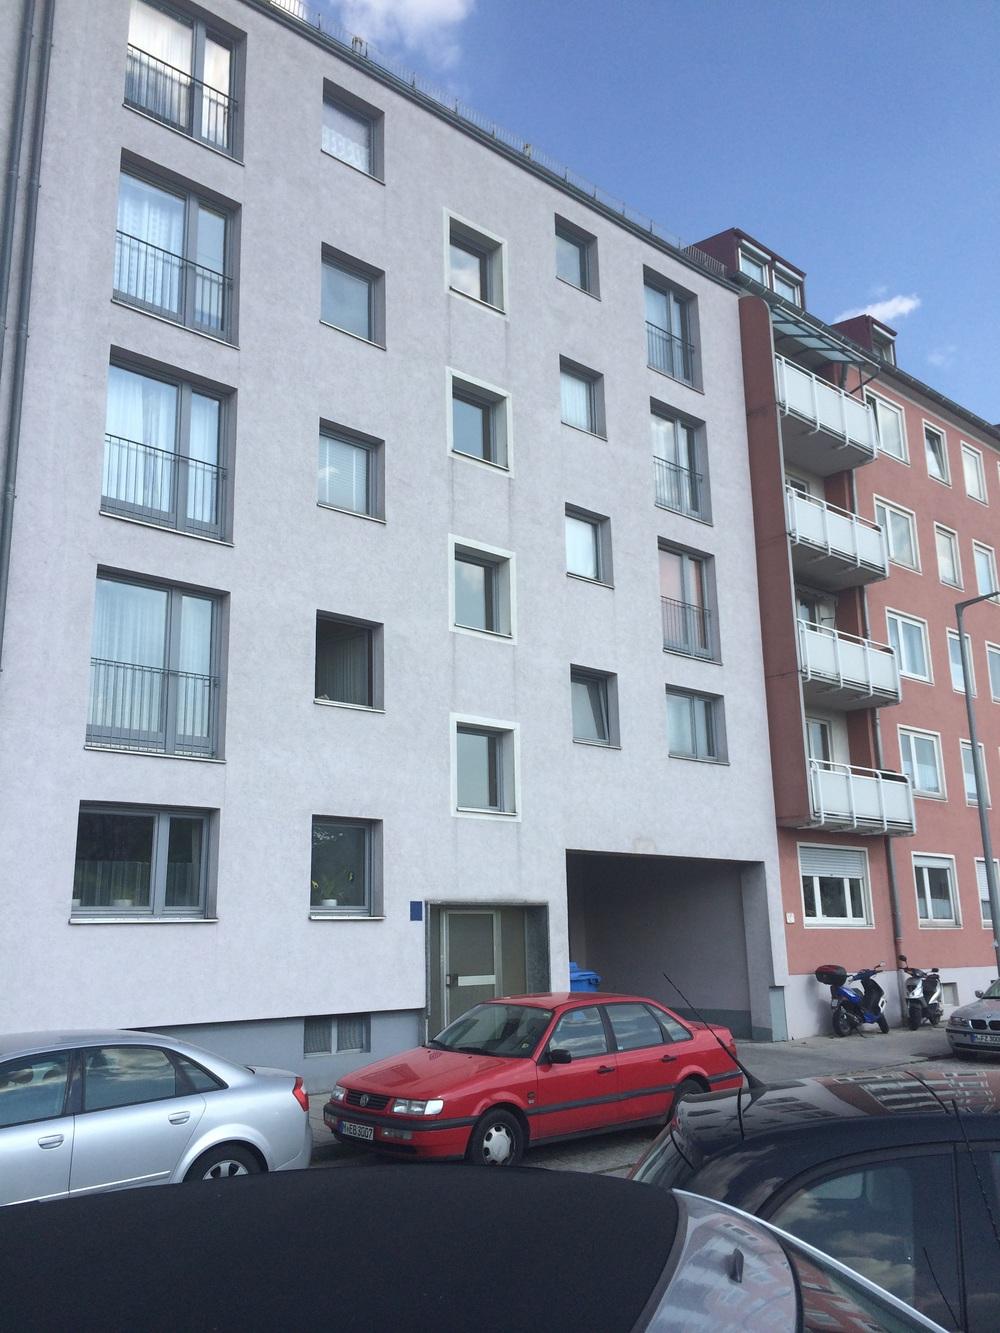 Mietshaus - Giesing